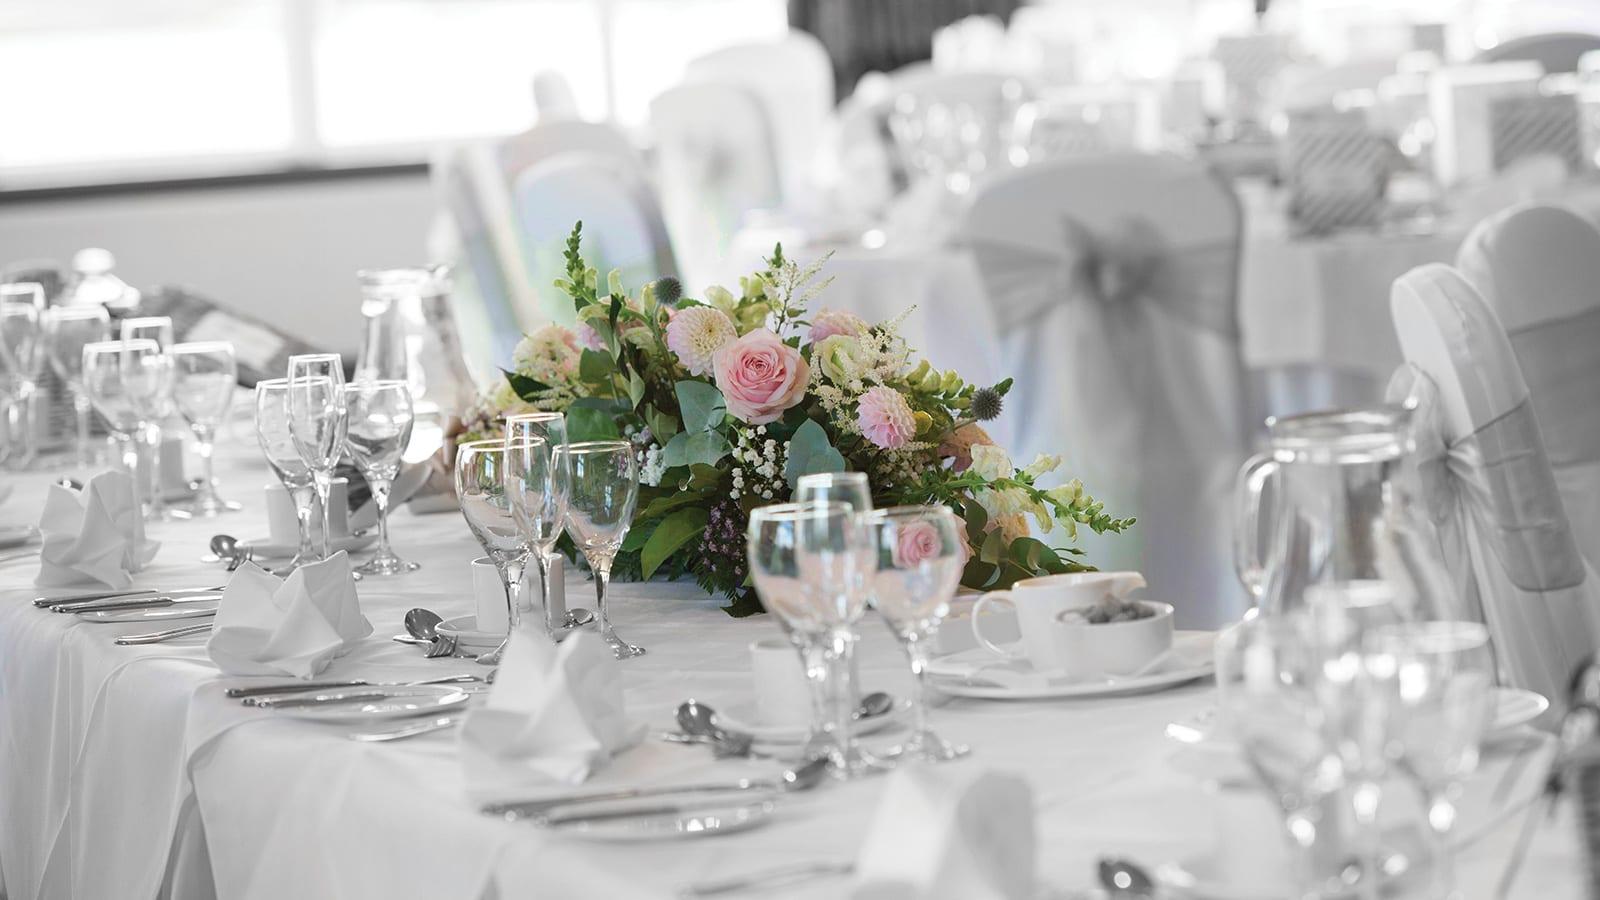 Lochside House Hotel Spa Amp Lodges Luxury Wedding Venue